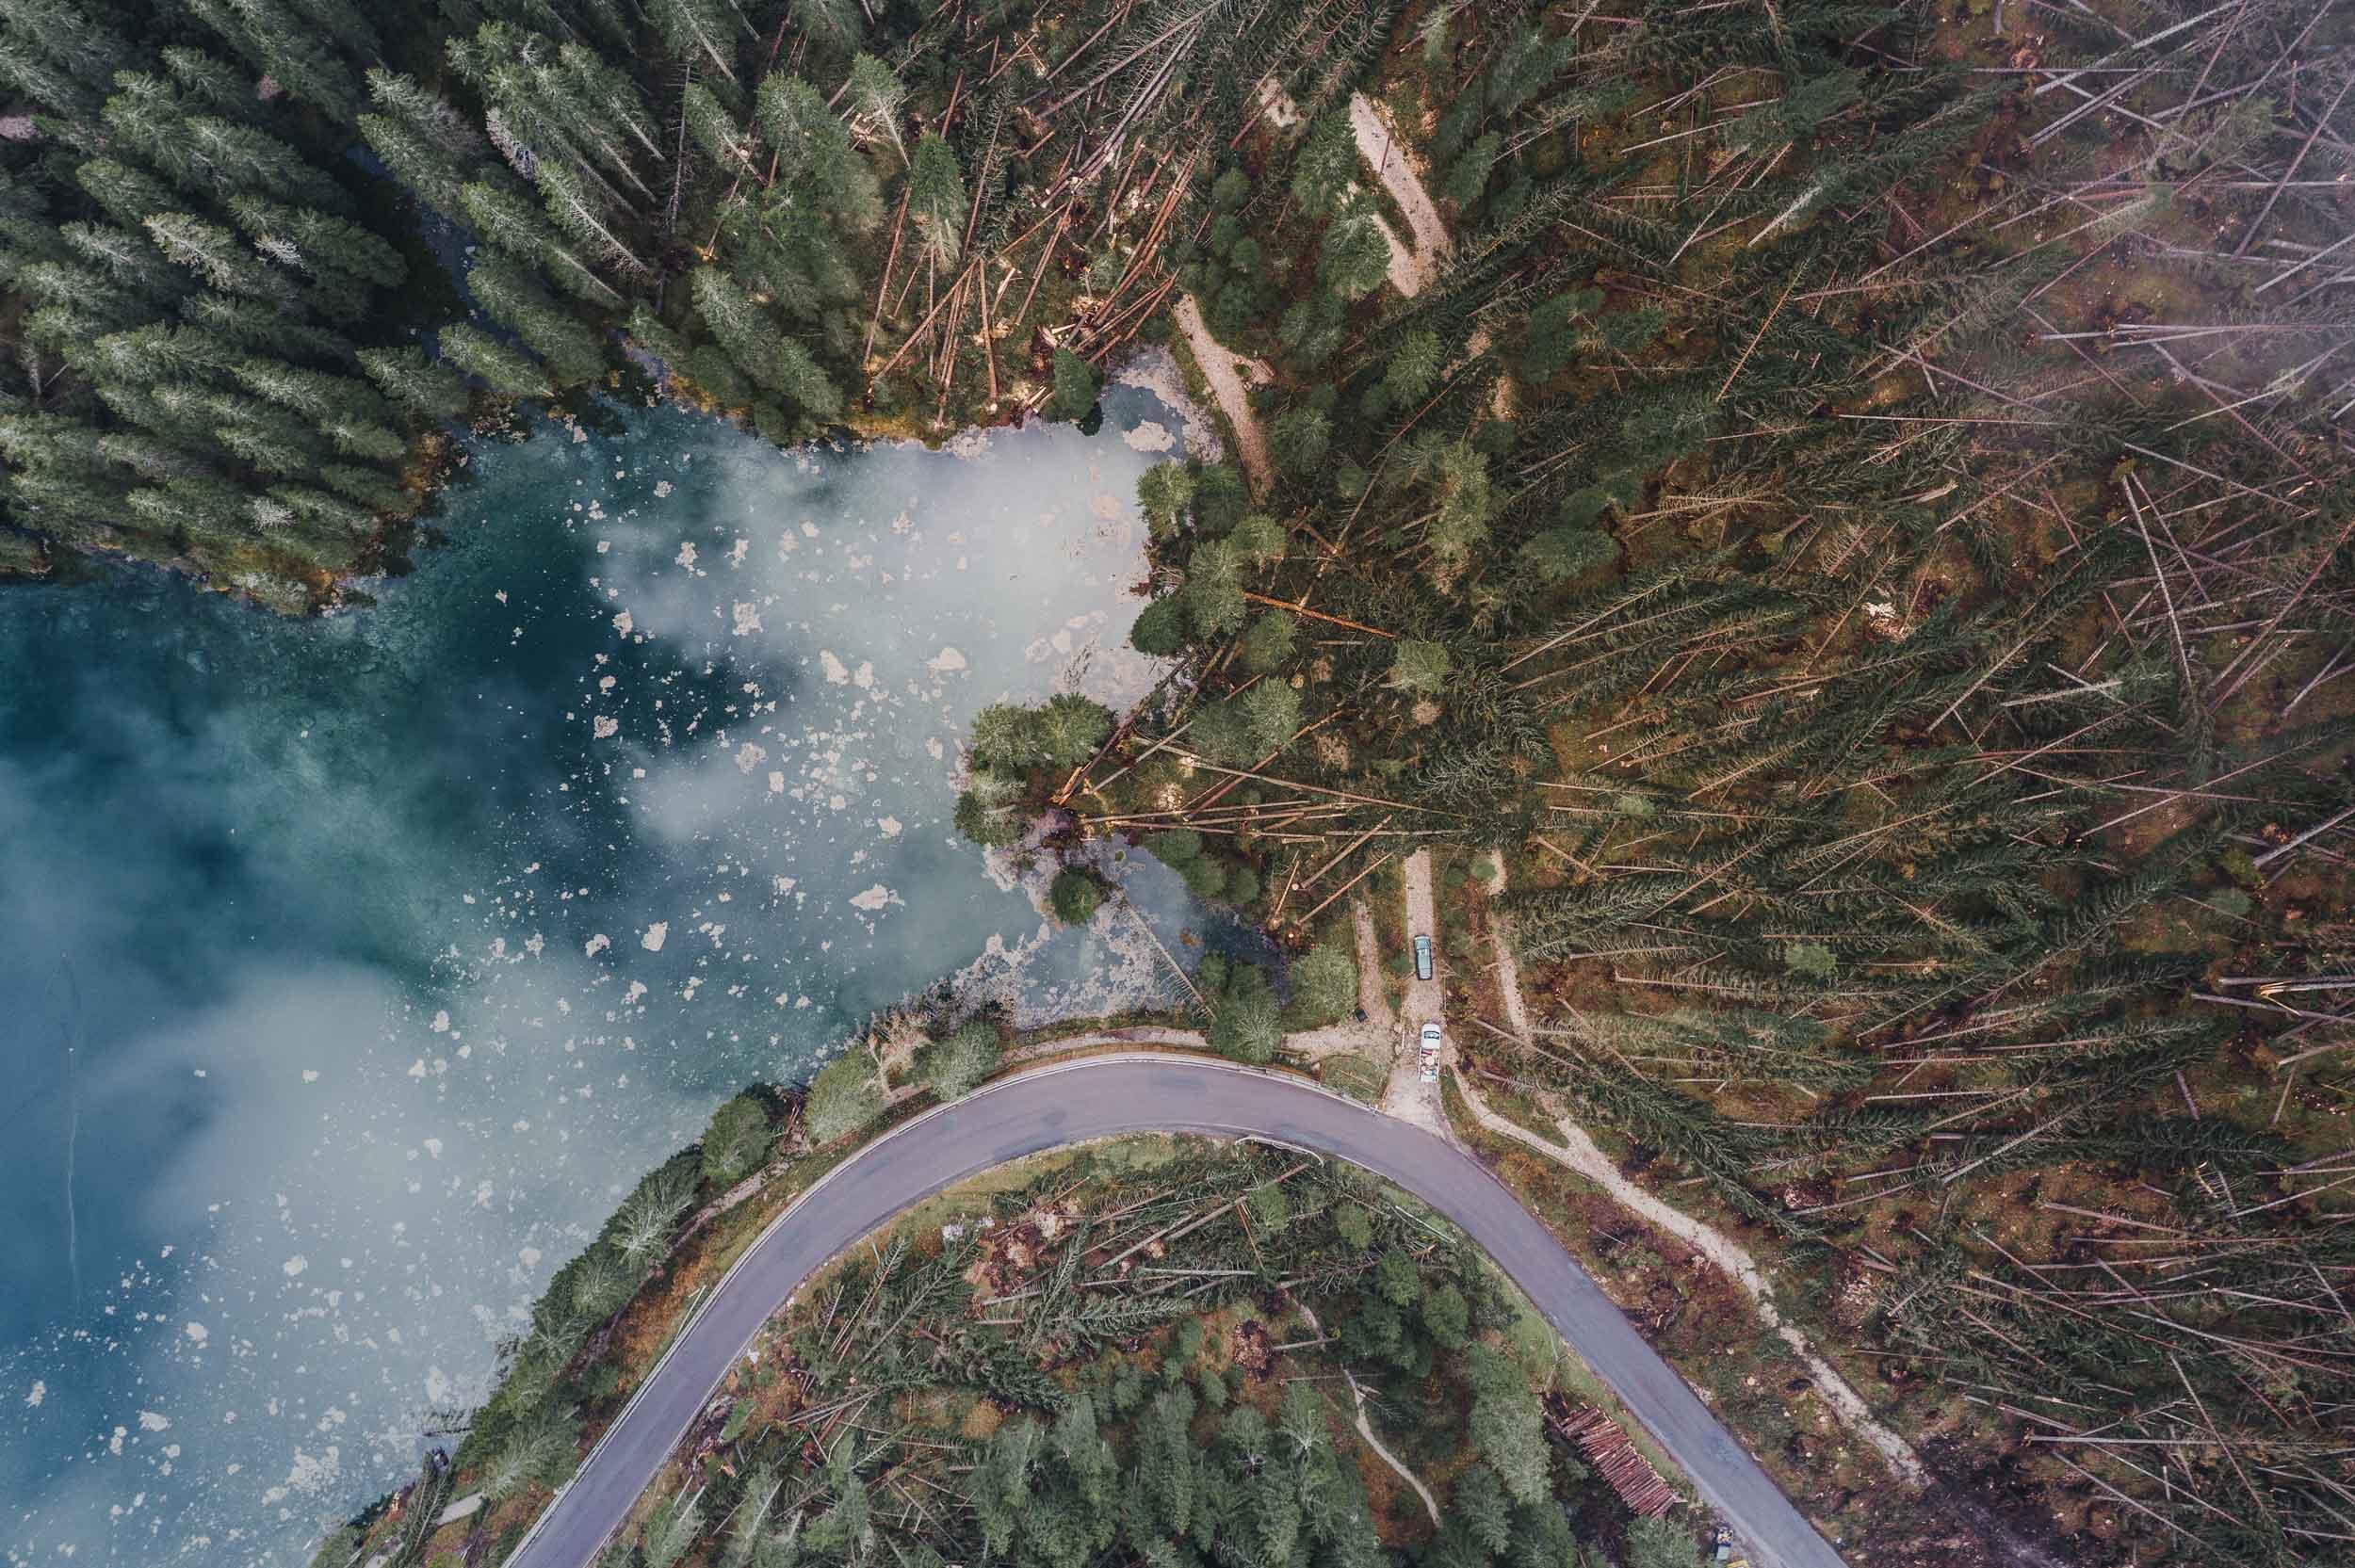 Lake Carezza with deforestation